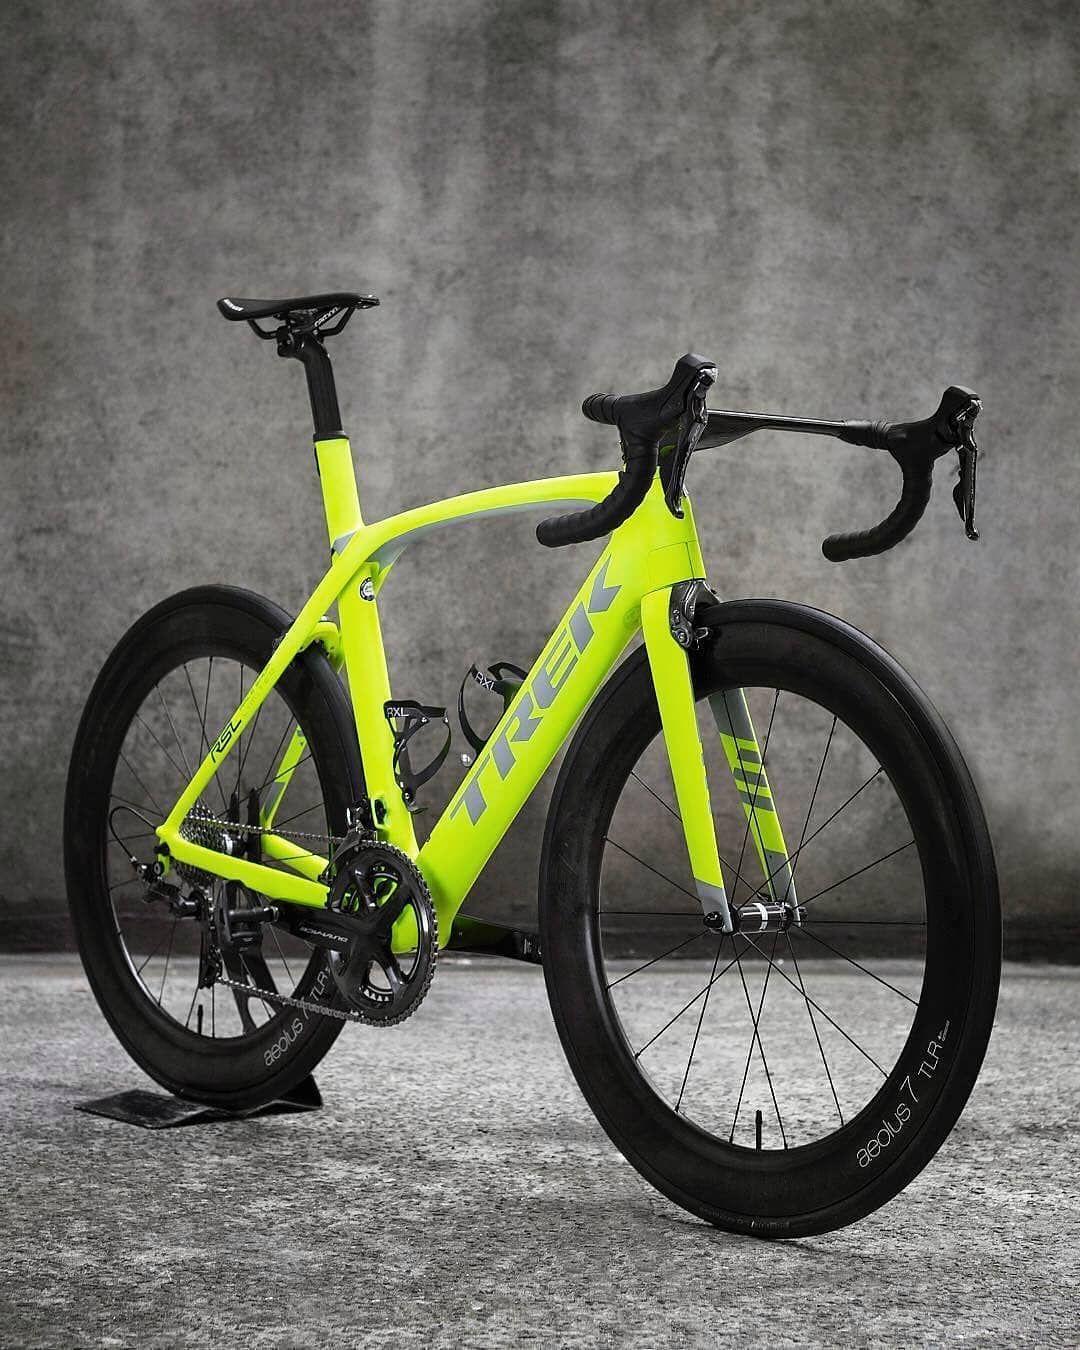 Mi Piace 3 380 Commenti 25 George Wadsworth Bikesofbeauty Su Instagram Repost Onlybike Trek Carbo Bicycle Road Bike Accessories Road Bikes